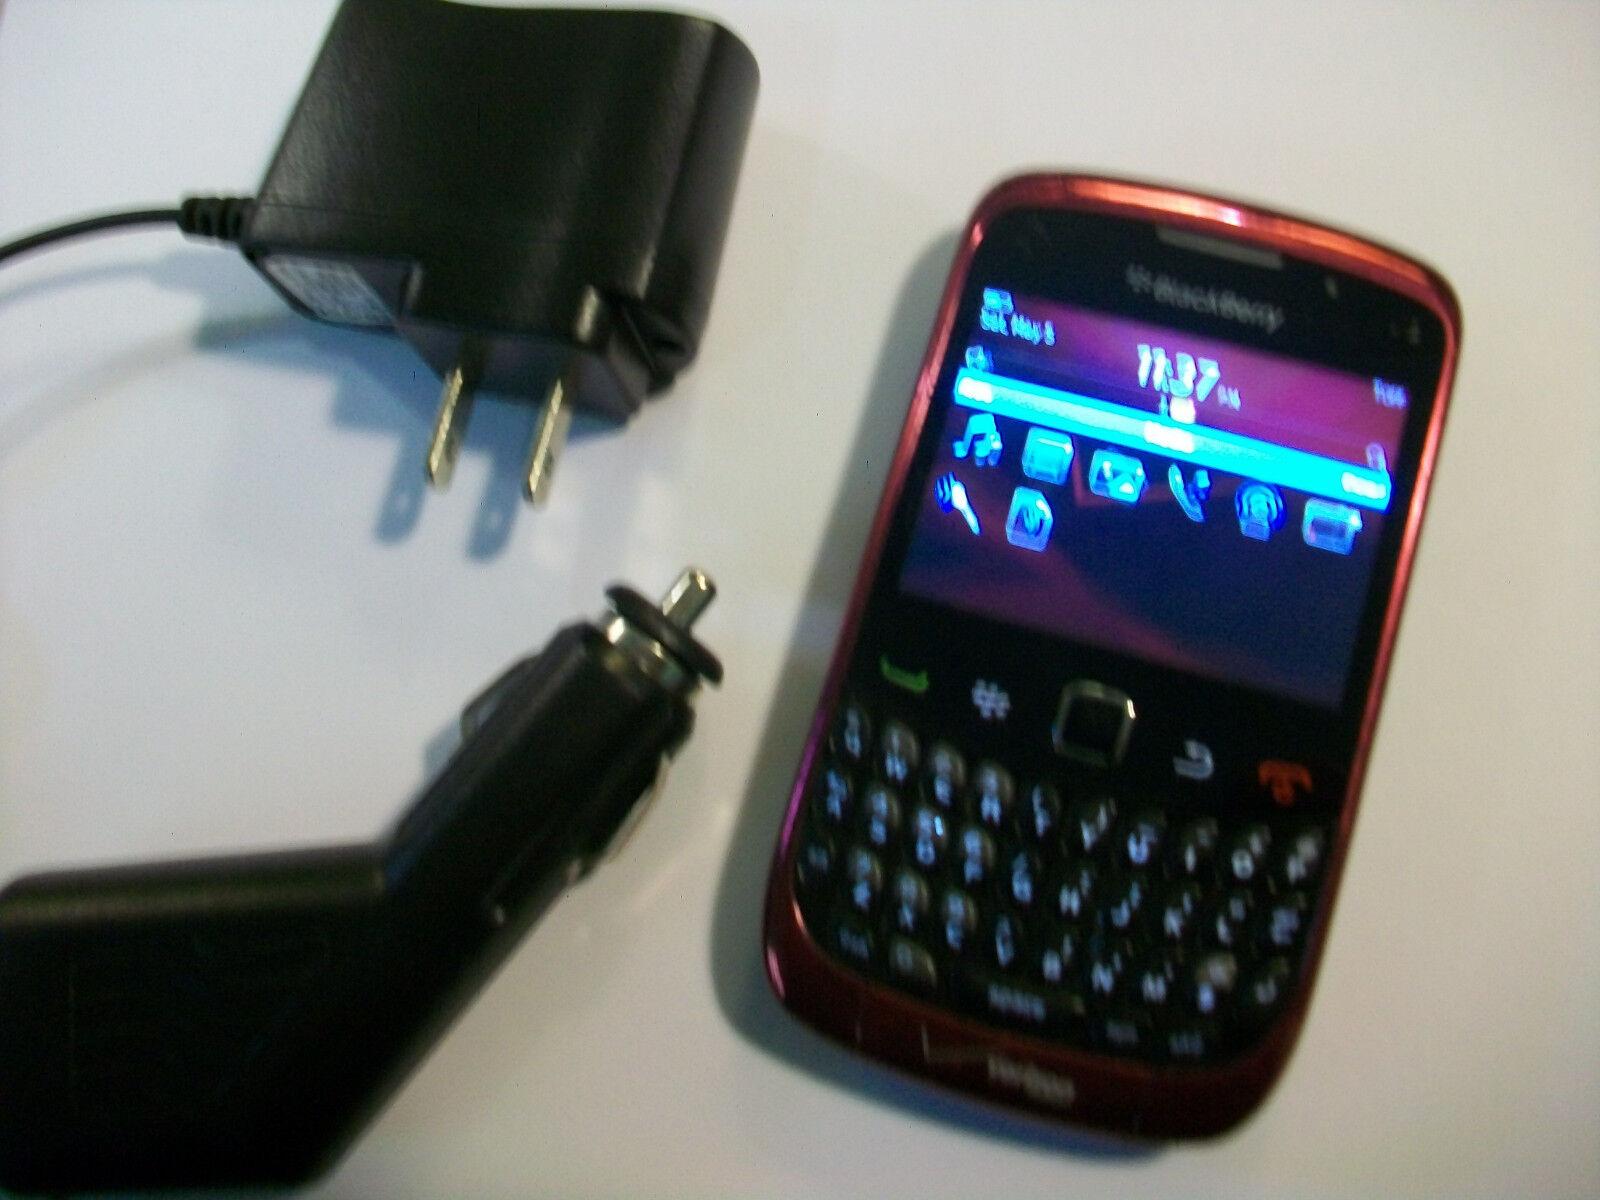 blackberry curve 9330 purple verizon smartphone ebay rh ebay com BlackBerry Curve 8900 BlackBerry Curve 9360